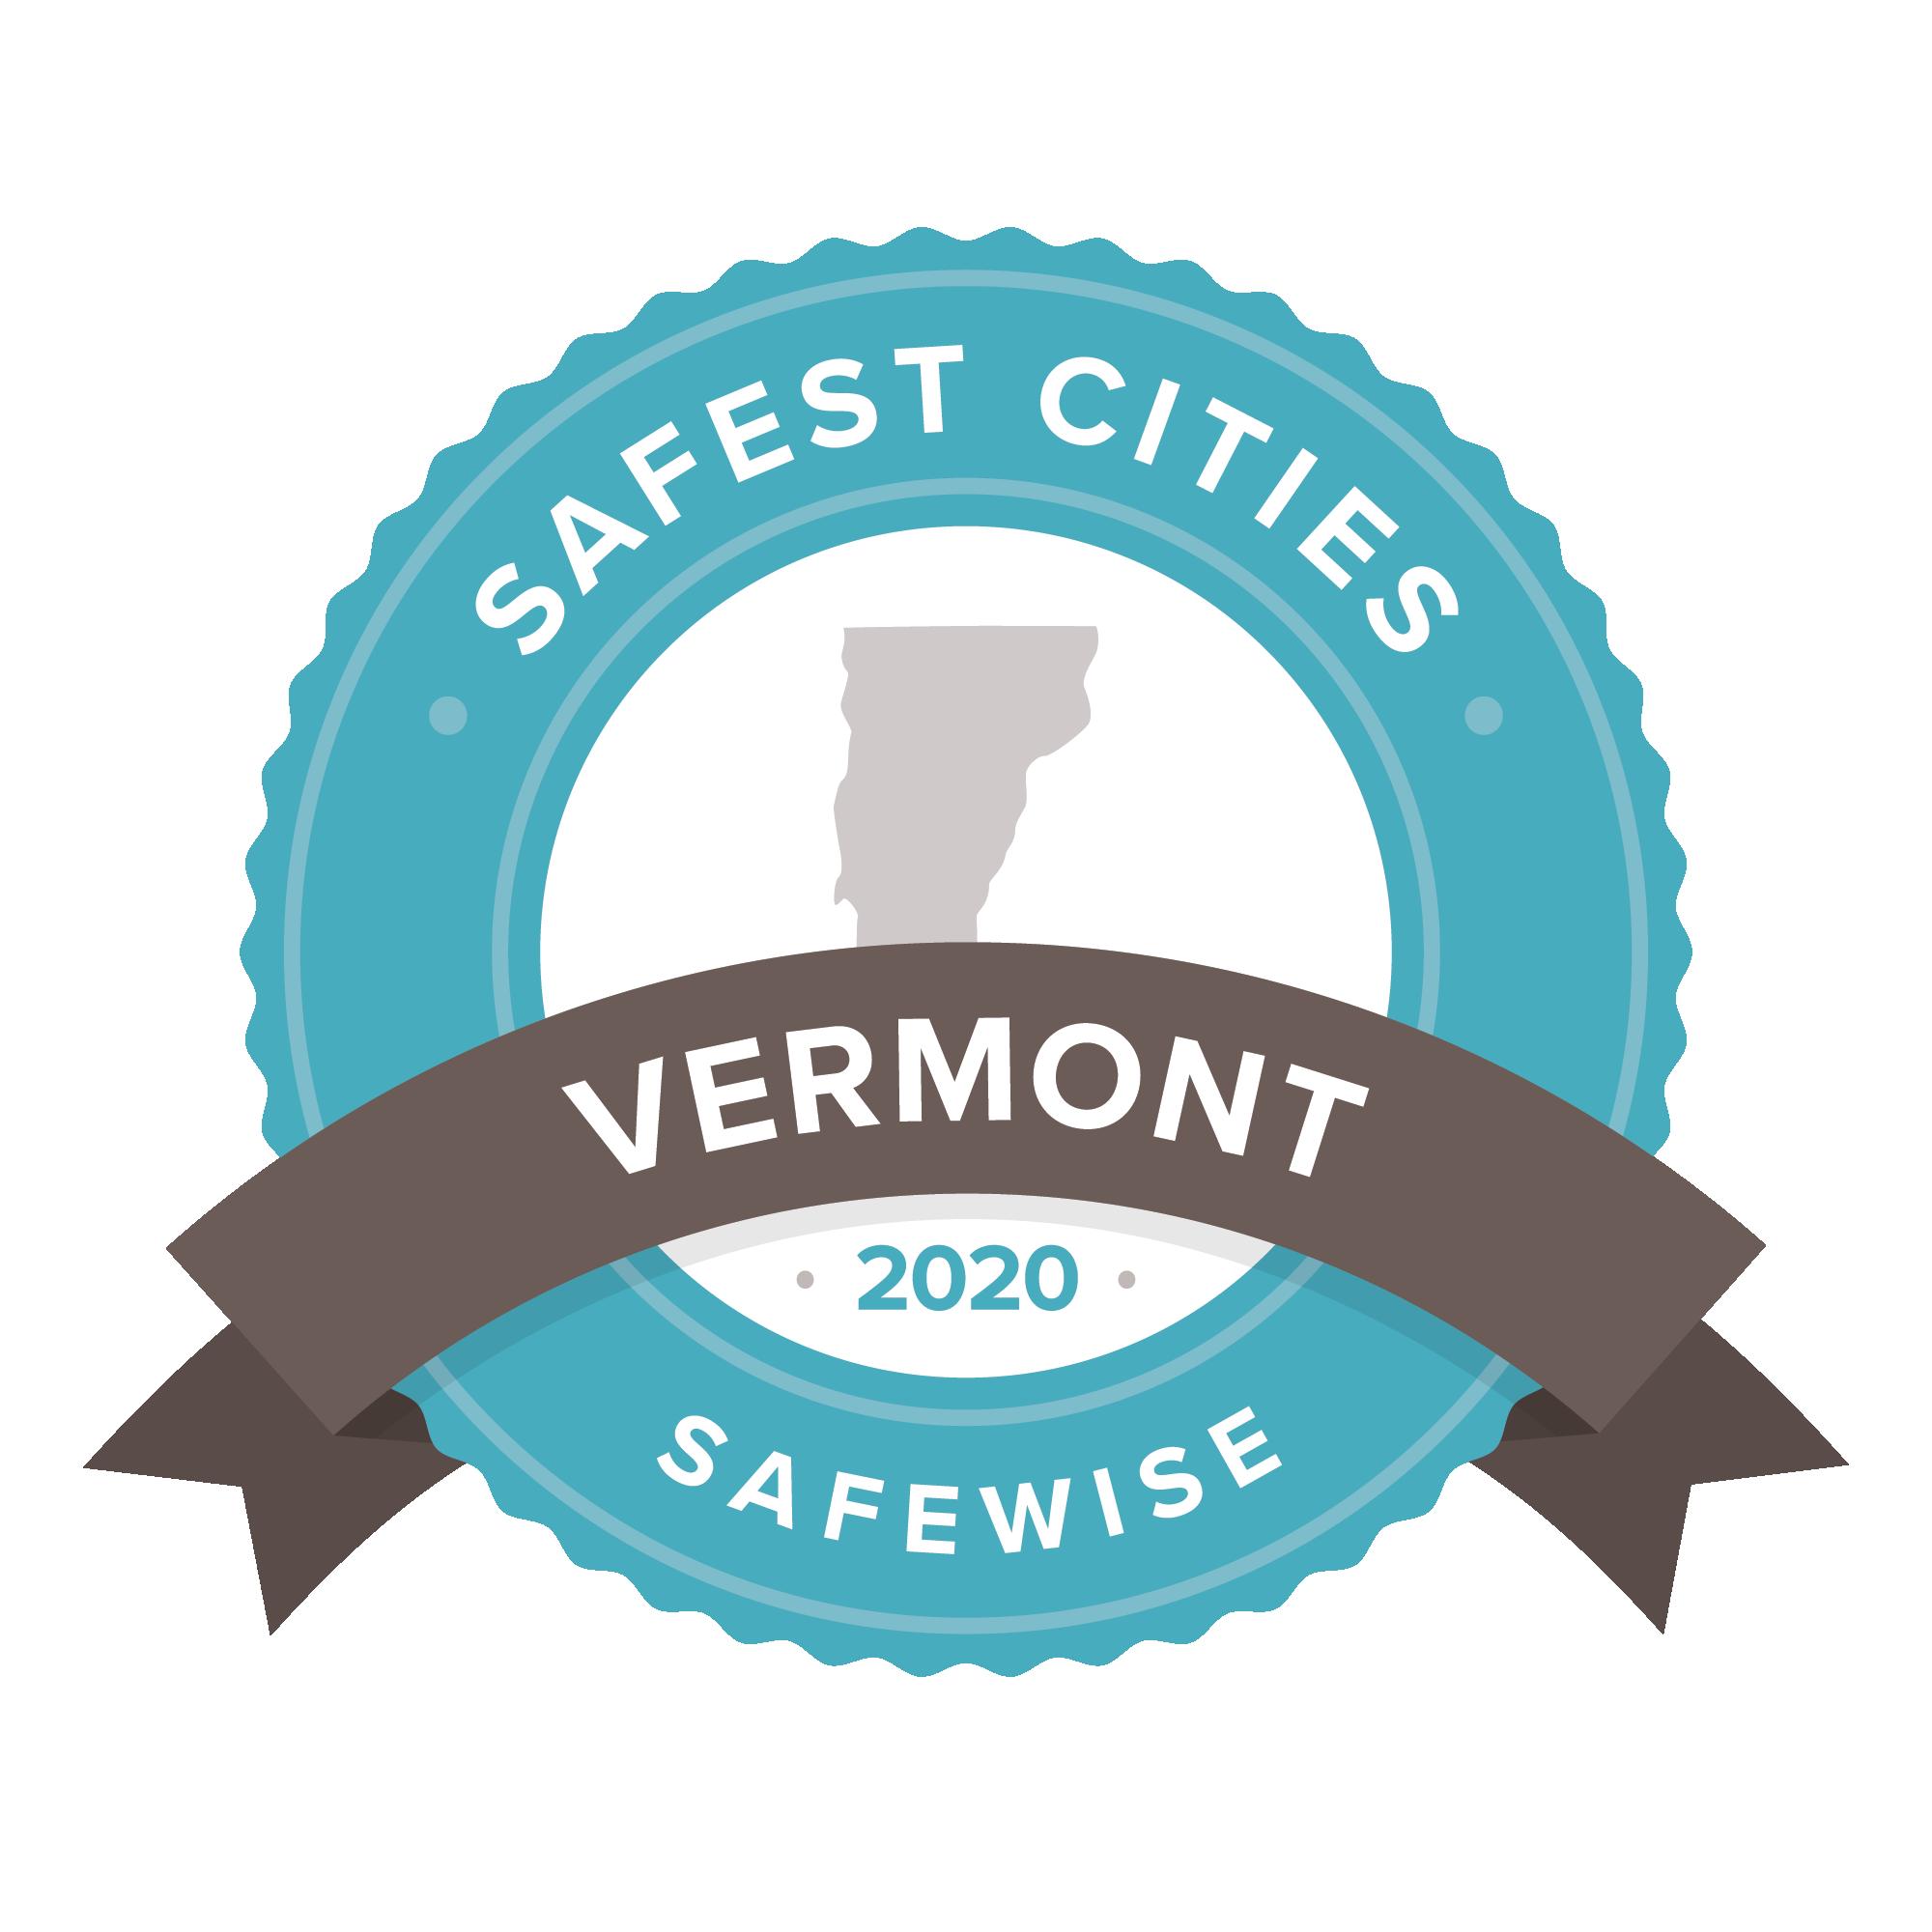 Vermont Safest Cities 2020 badge